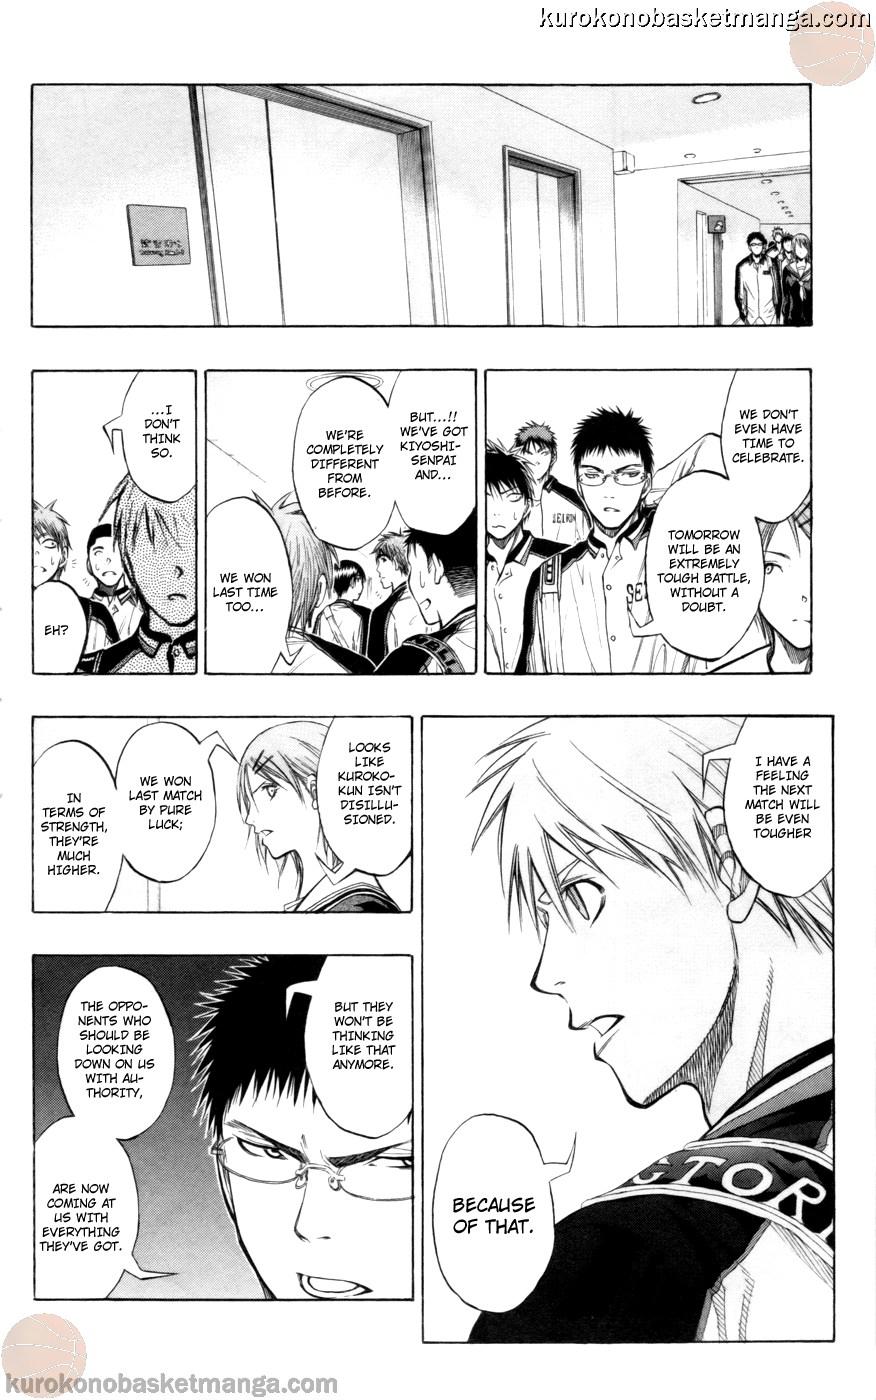 Kuroko no Basket Manga Chapter 85 - Image 06